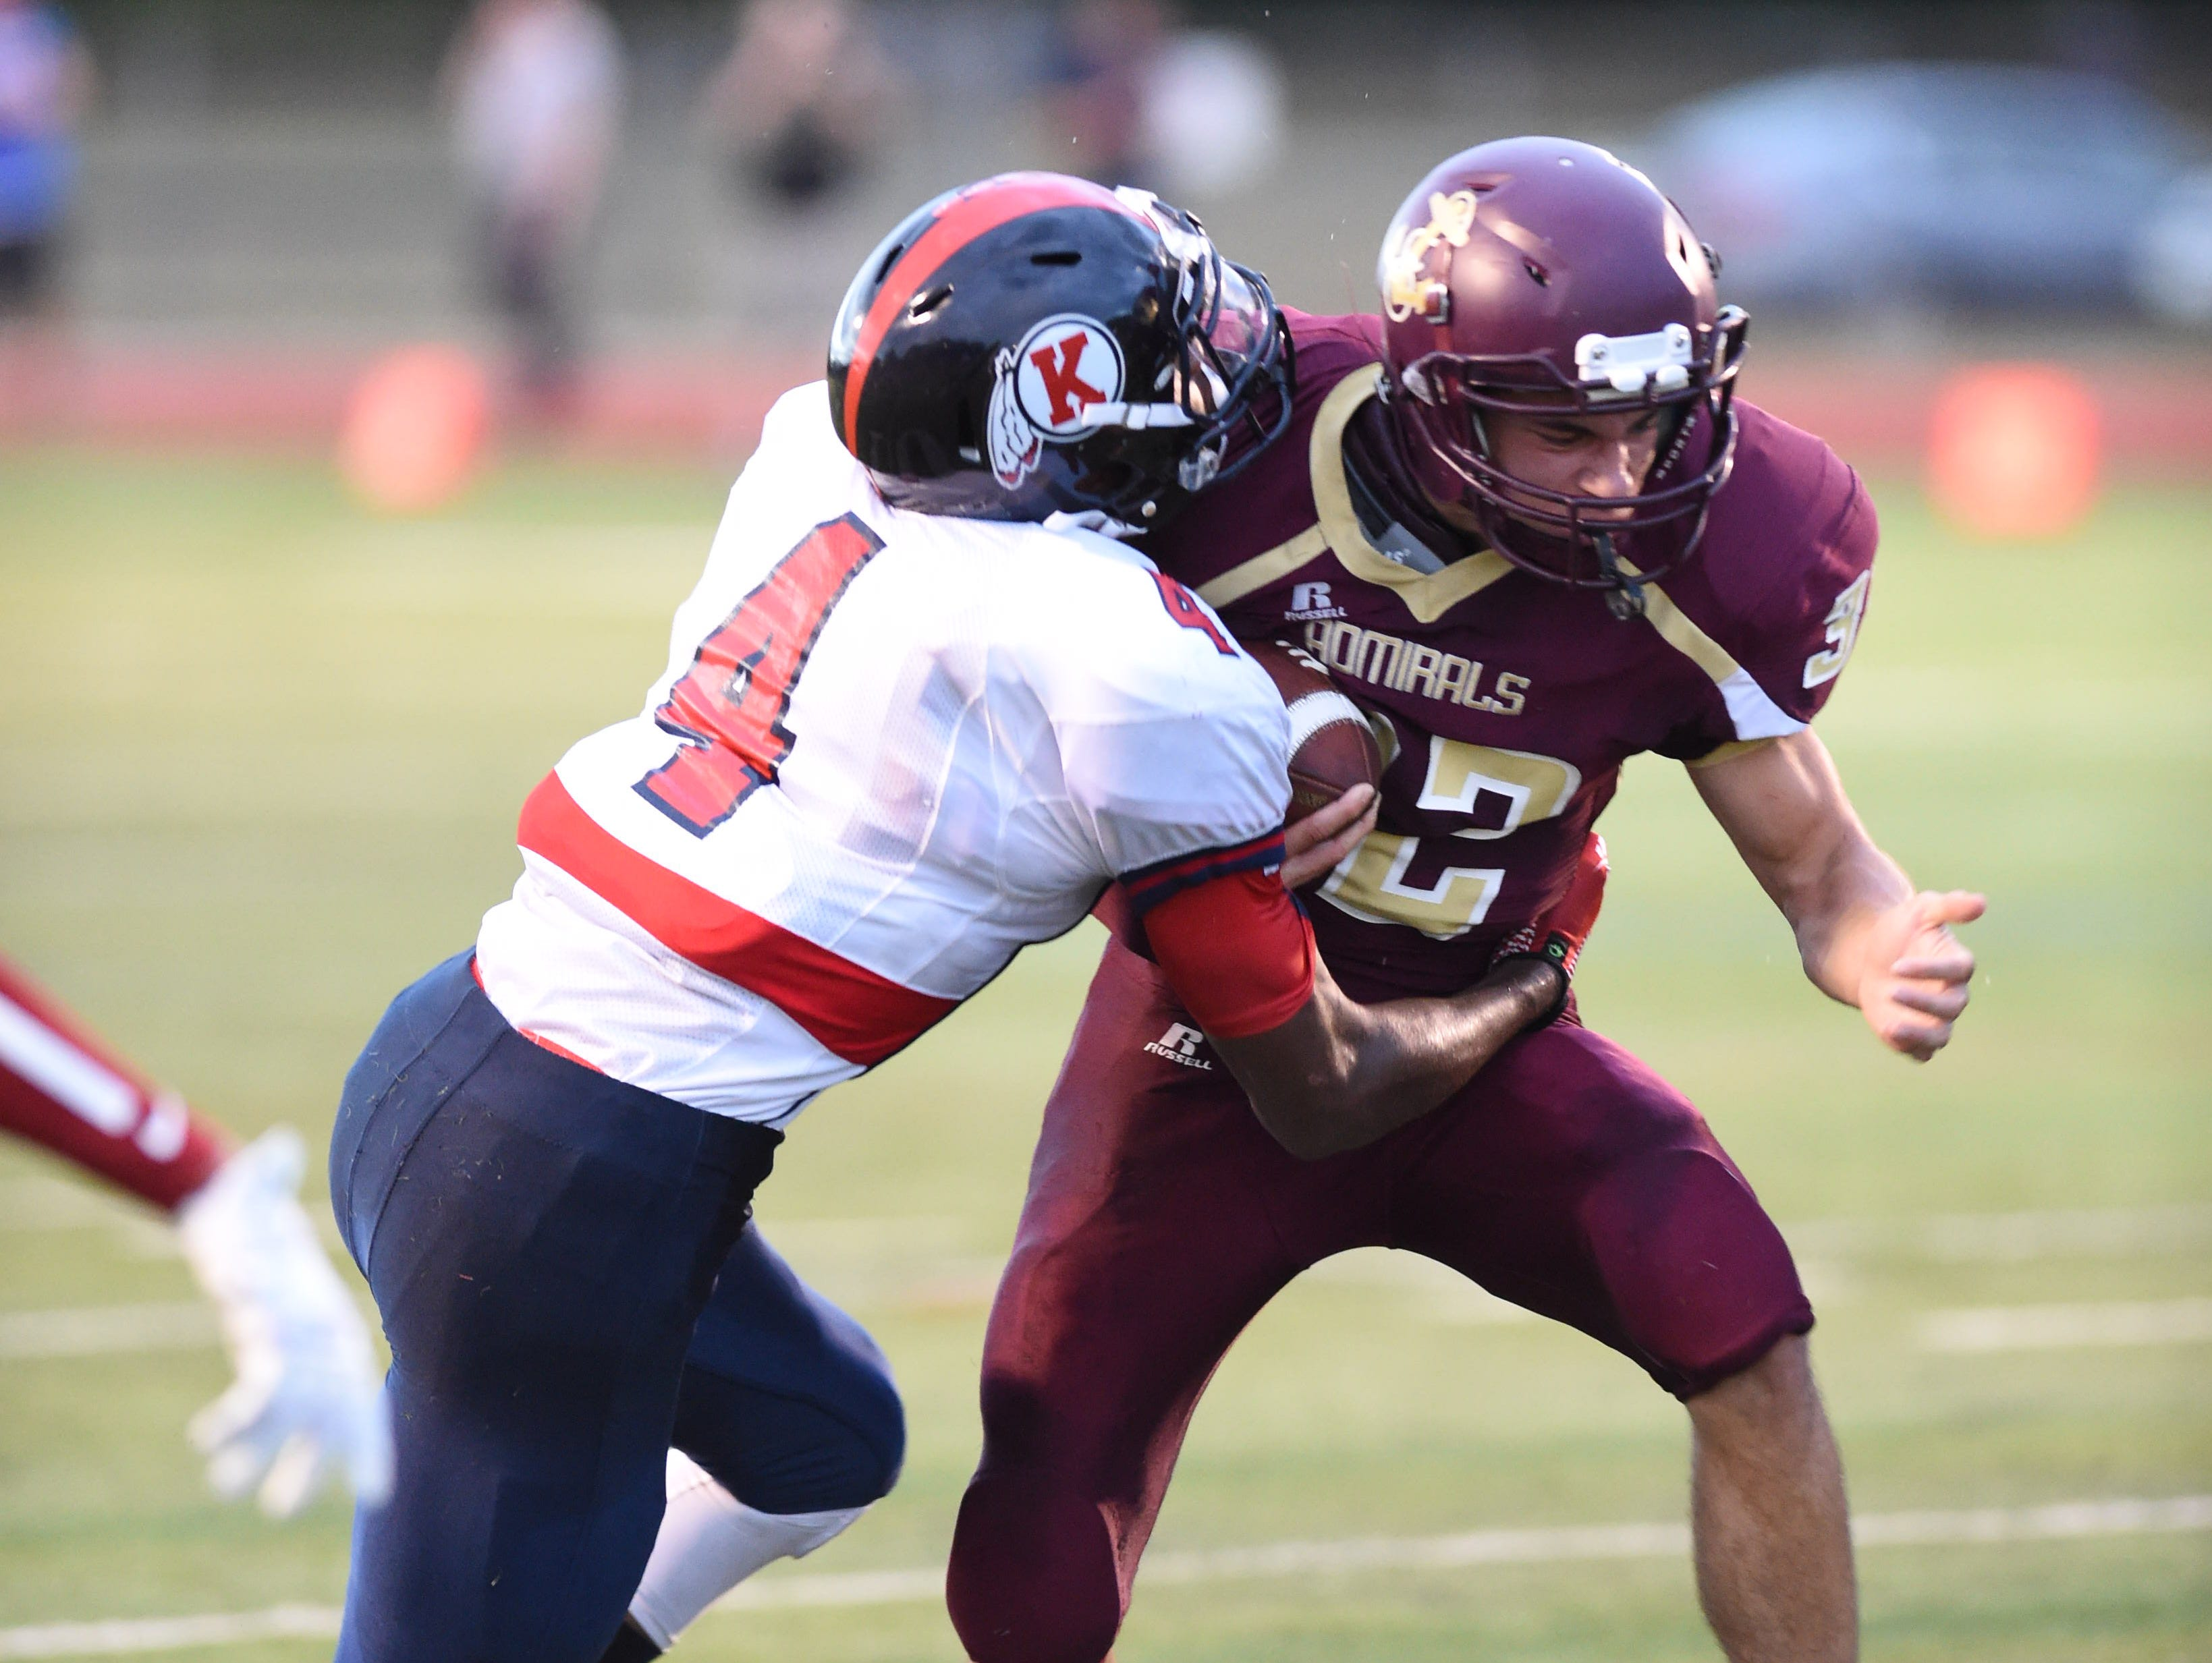 Ketcham's Jyaire Stevens tackles Arlington's EJ Escoto during Friday's game at Arlington High School.